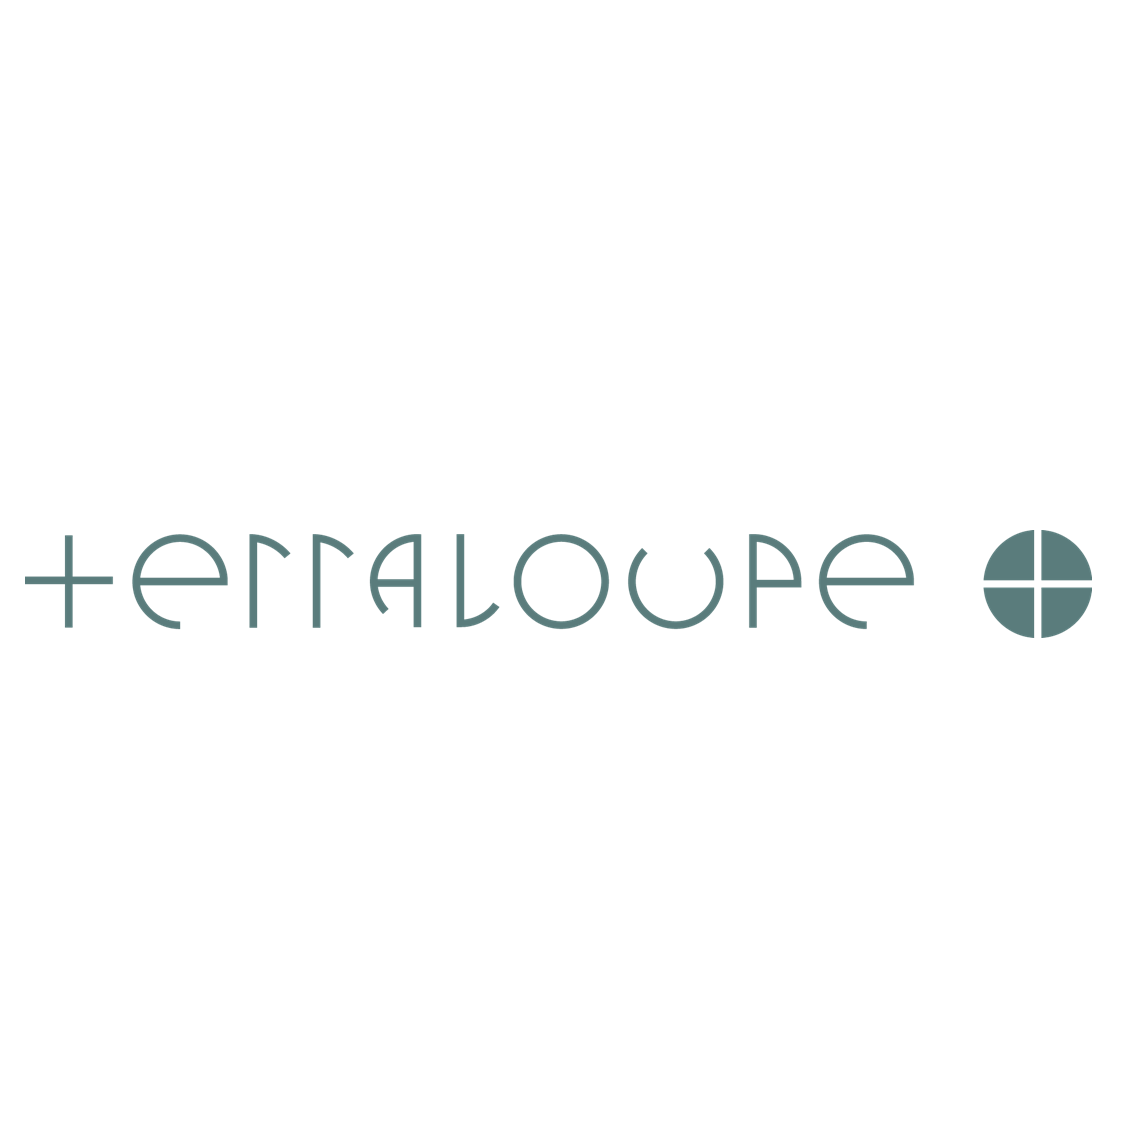 Terraloupe